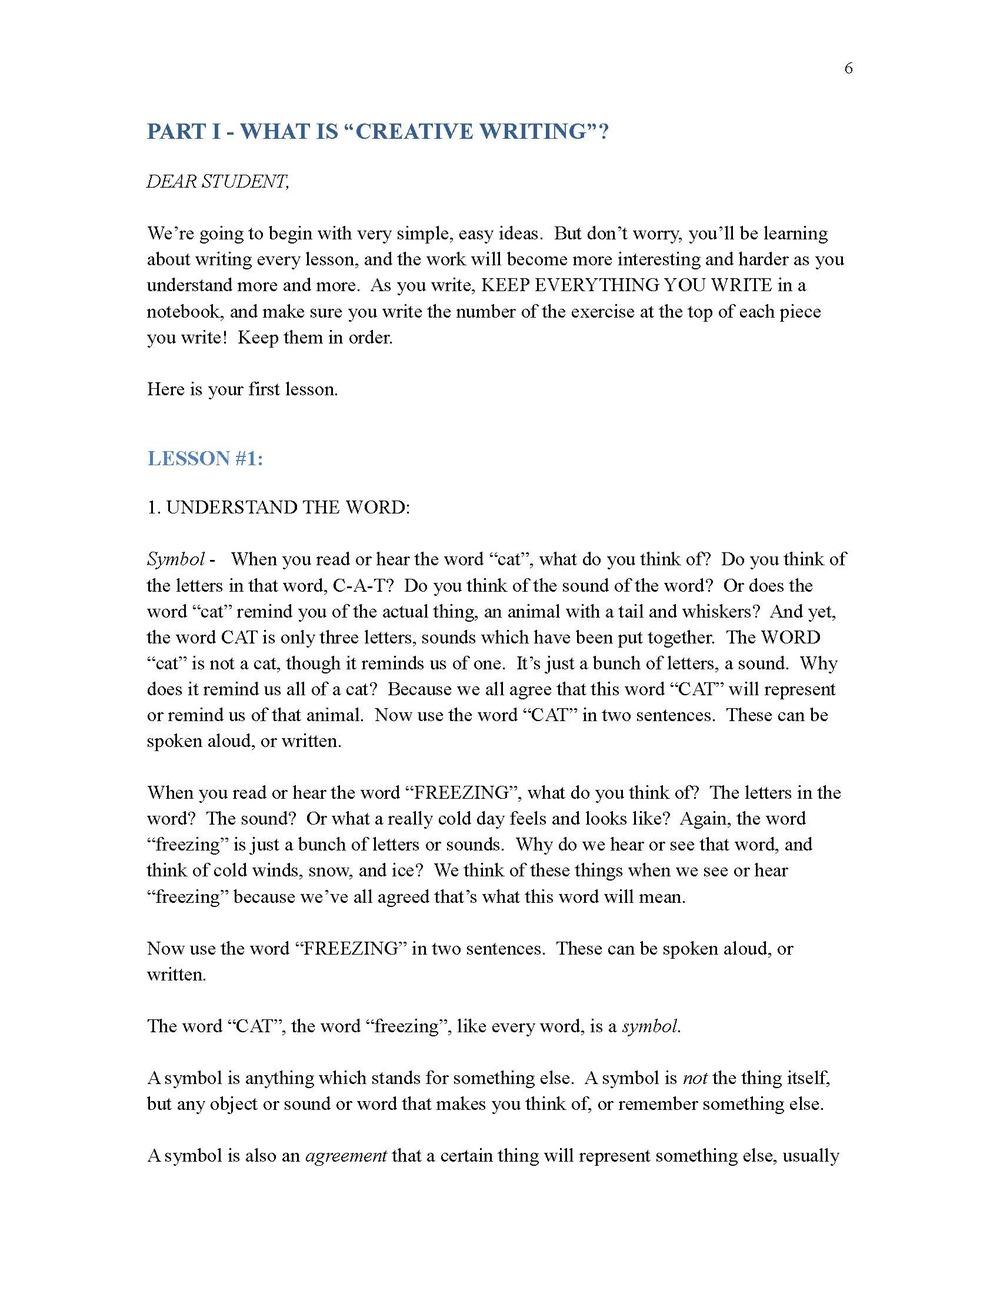 Samples Step 3-4 Creative Writing 1_Page_07.jpg